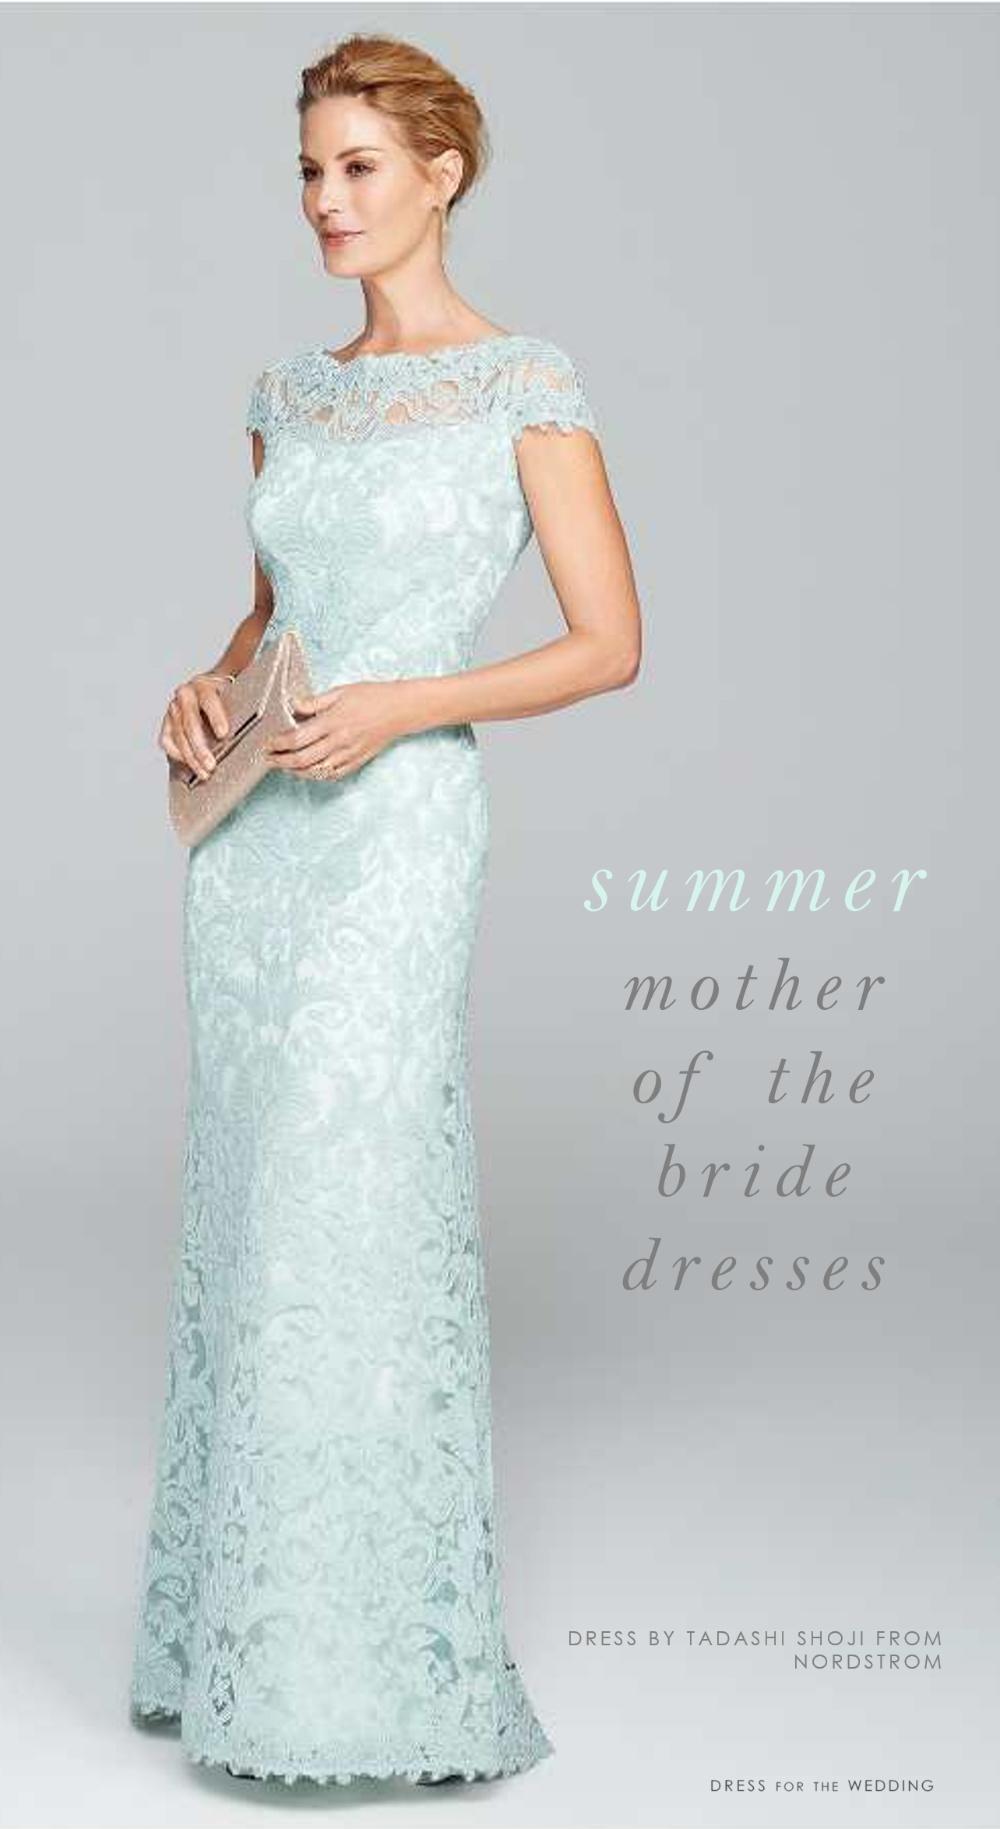 Wedding Mothers S Nordstrom Groom Dresses